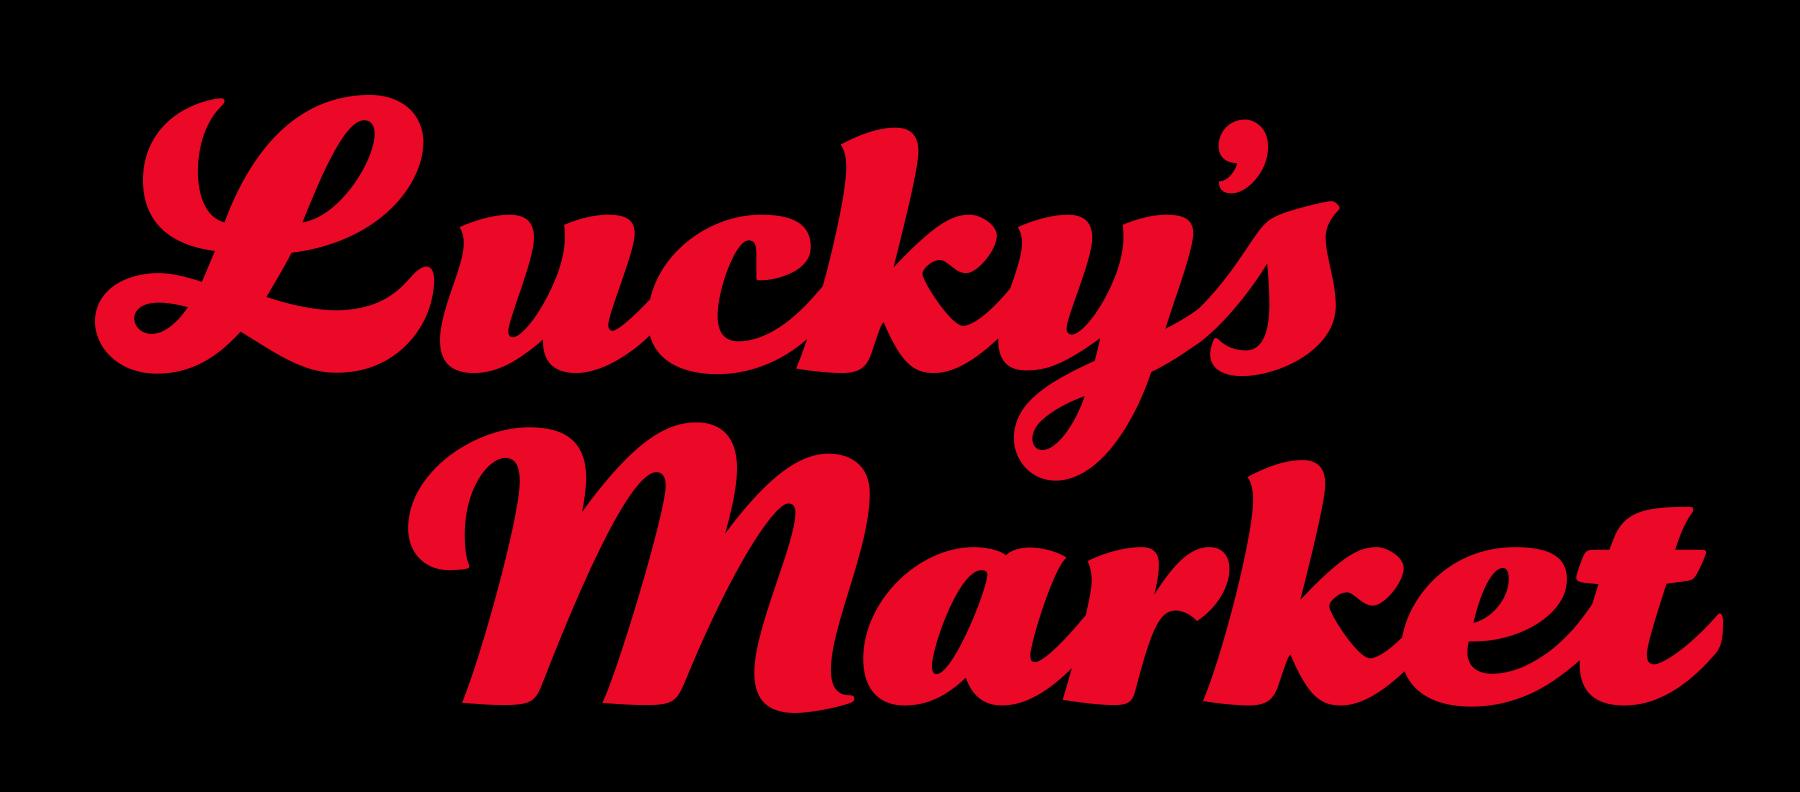 luckysmarket_logo_vector.png